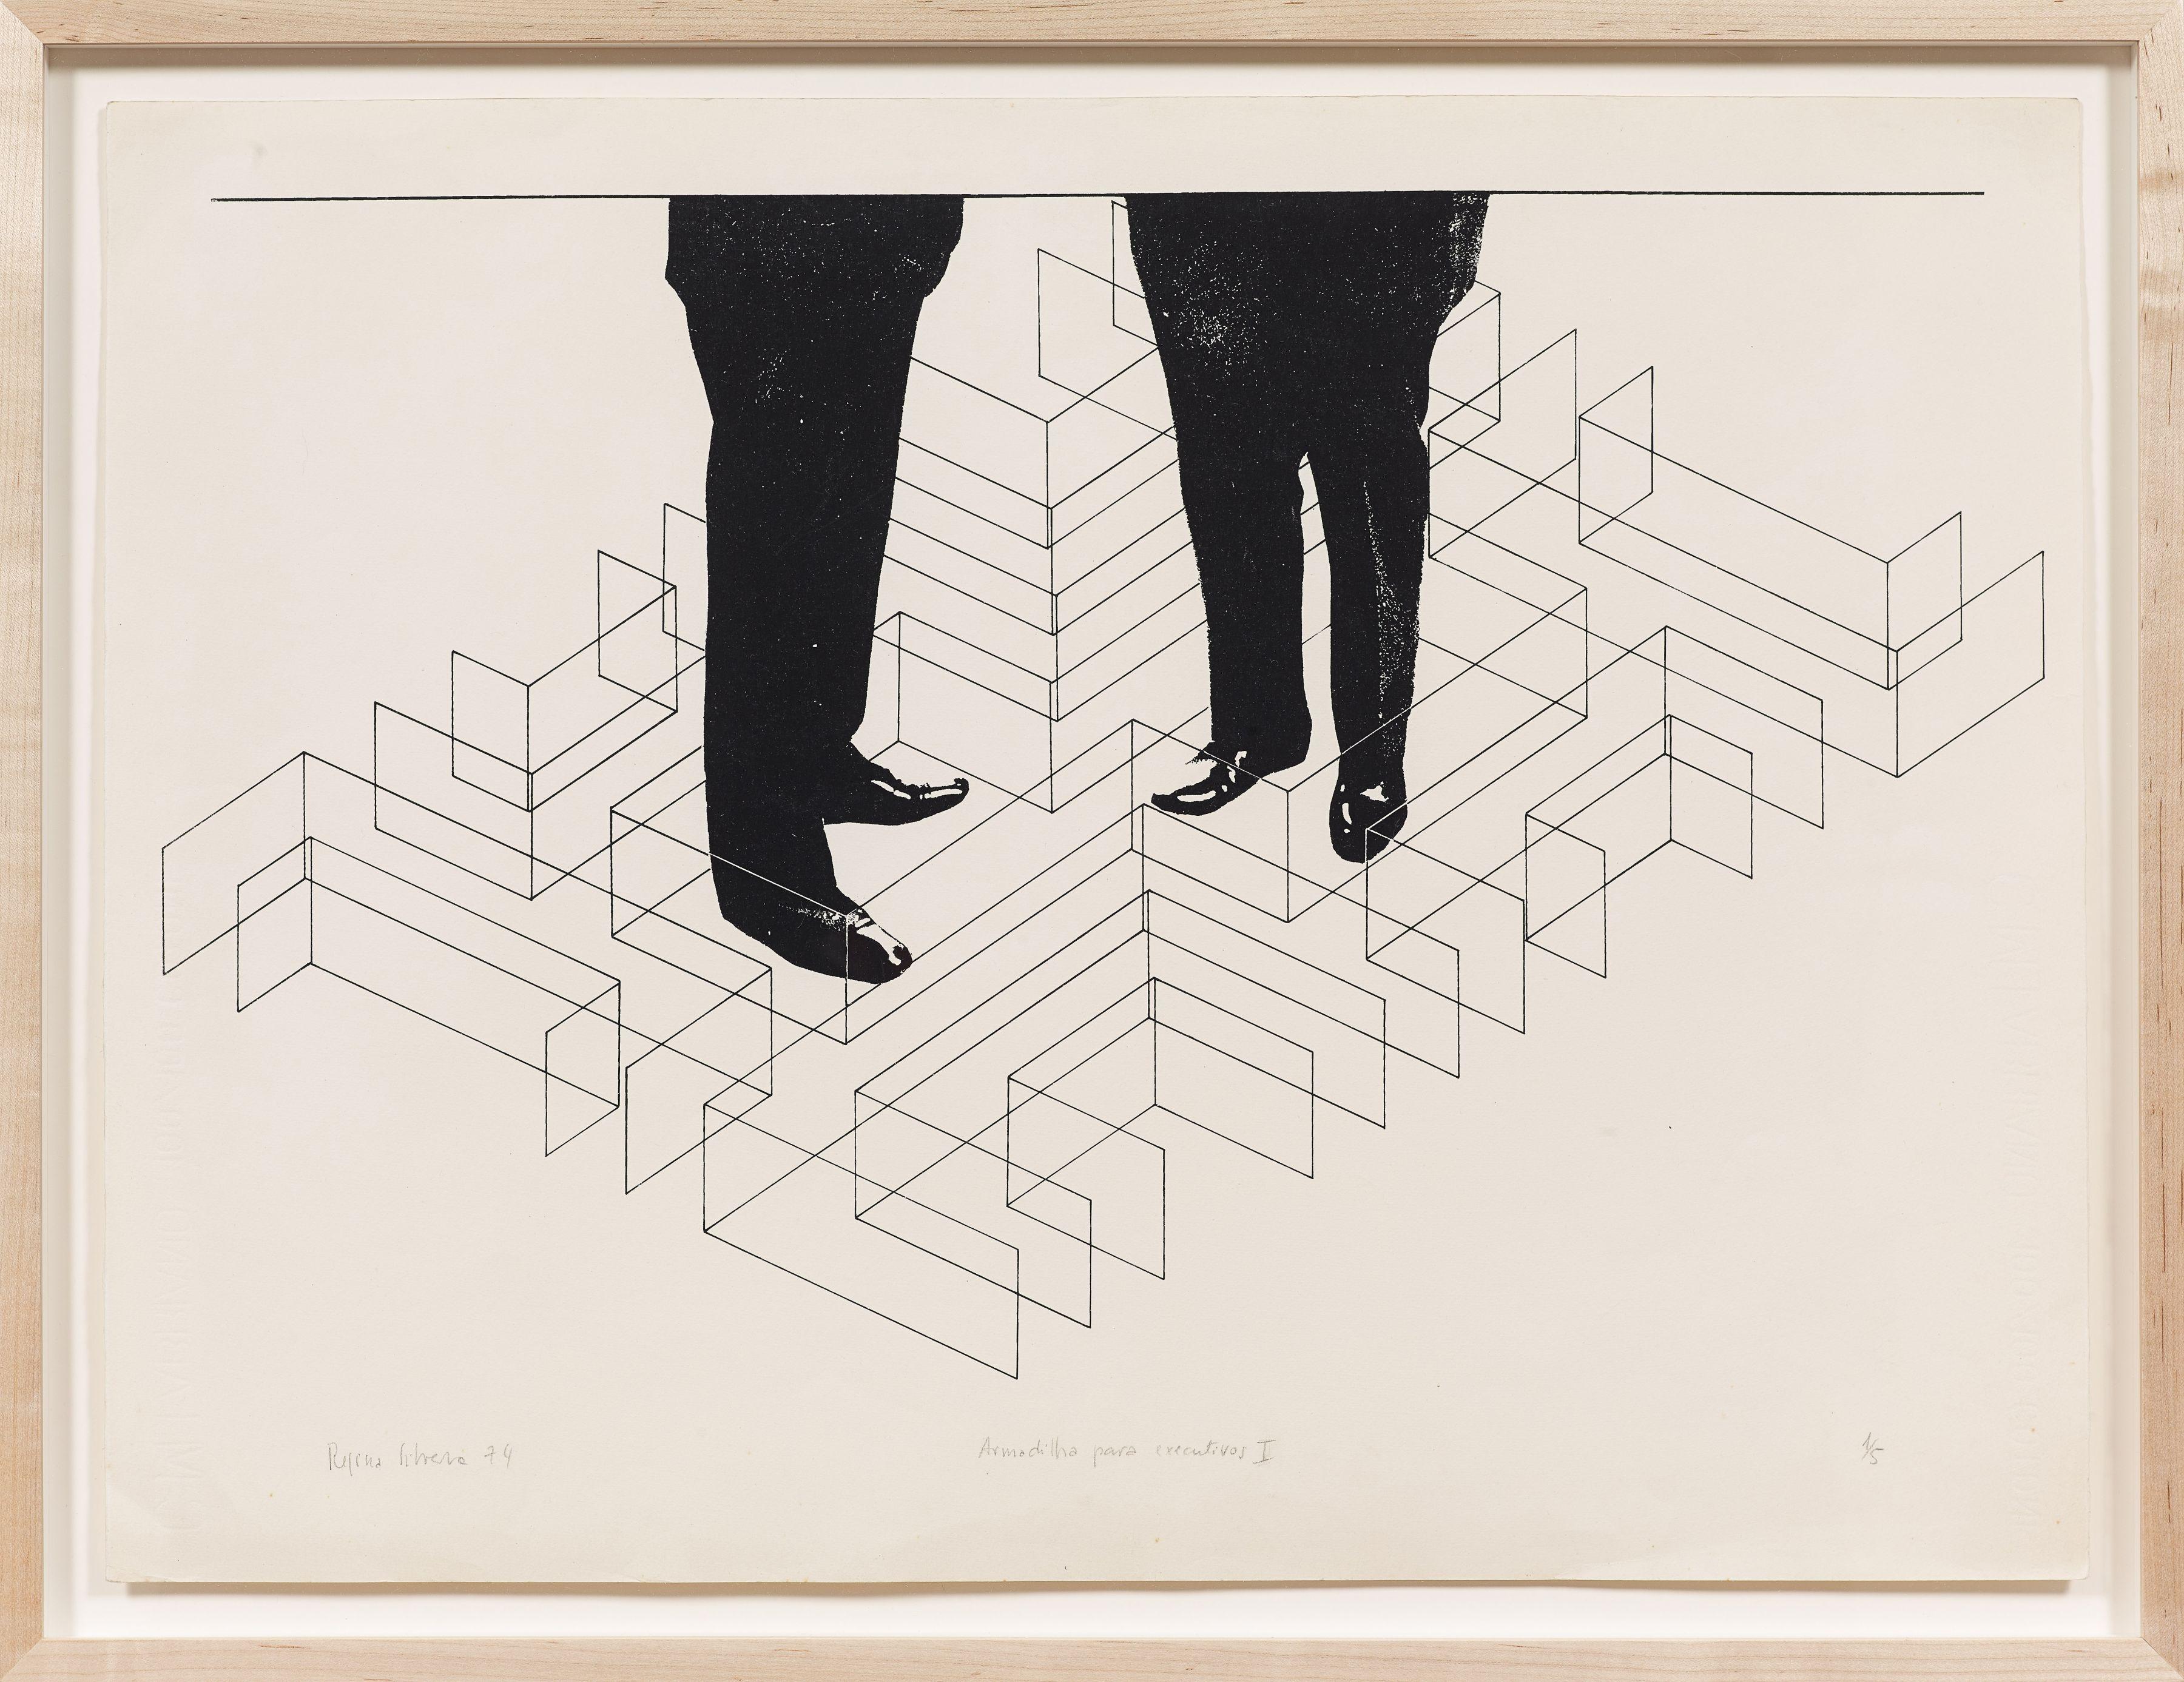 Armadilha para executivos I, 1974, Silkscreen, 21.85h x 27.75w in (55.51h x 70.49w cm)